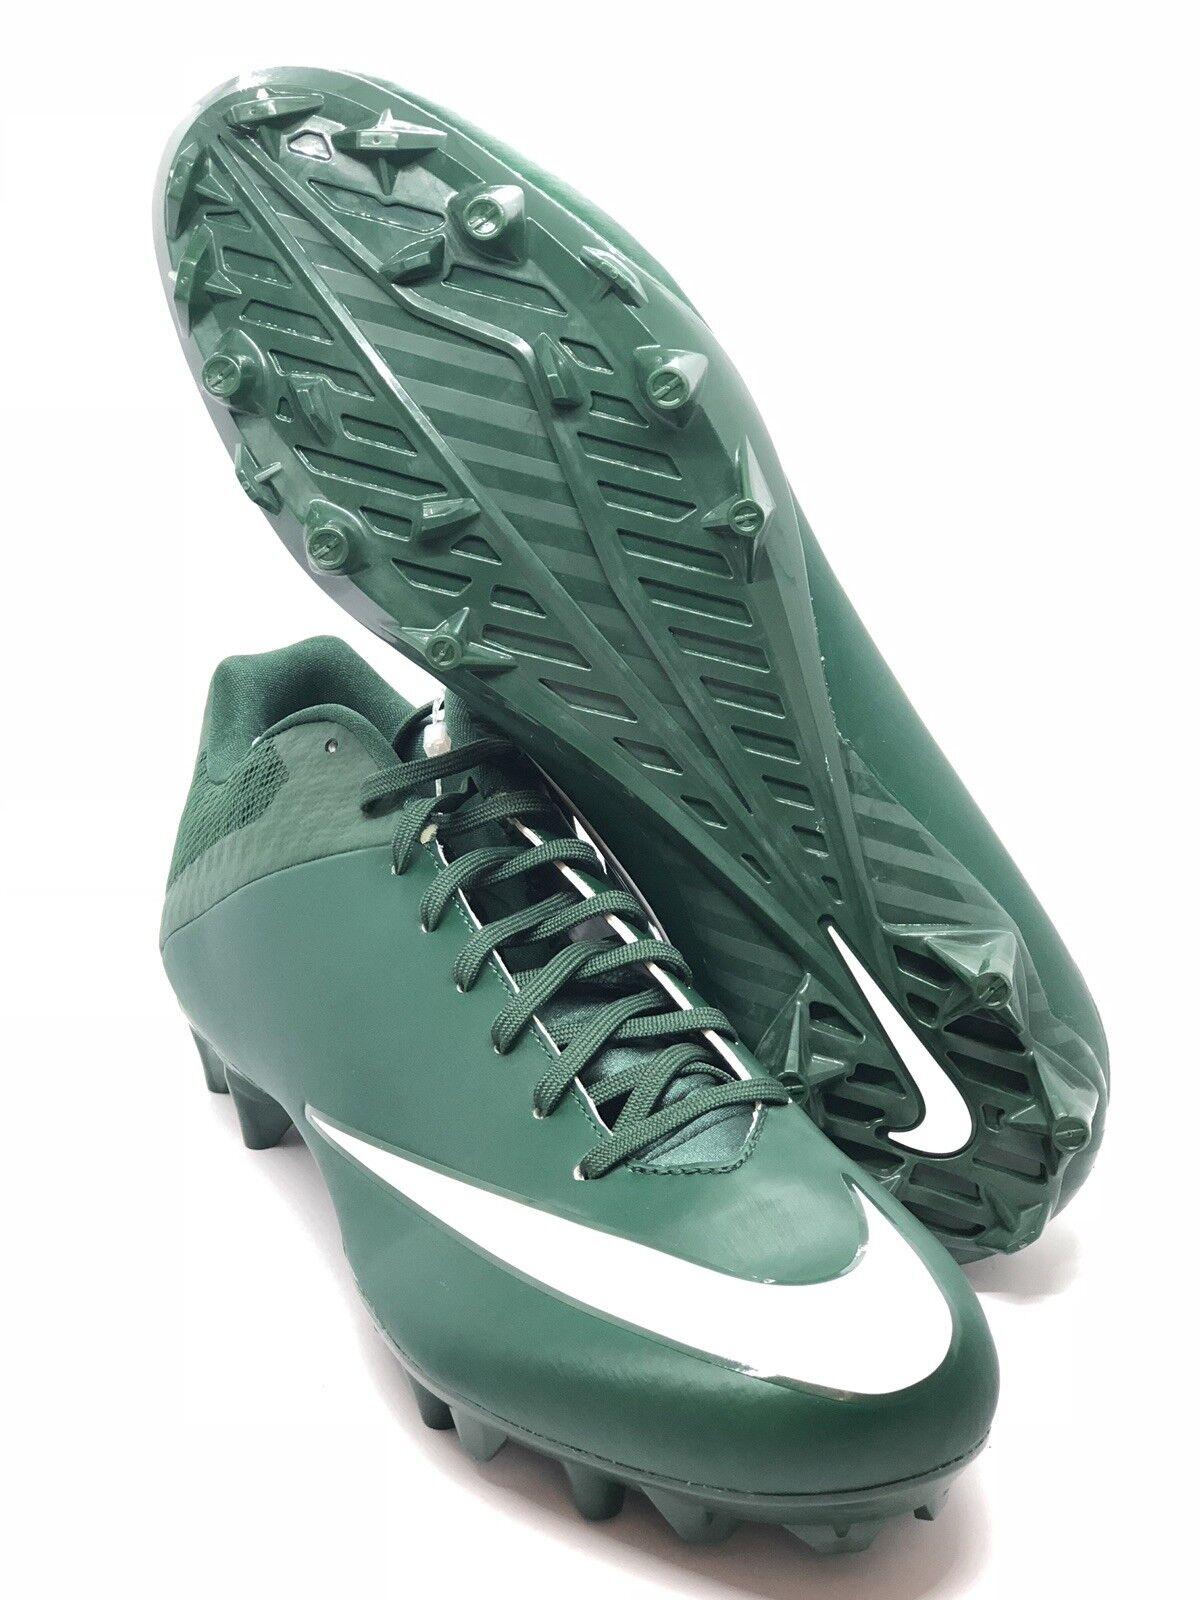 98b873c358c Vapor Speed 2 Low TD CF Football Cleats - Green White 847097-311 Sz 15 NIKE  Mens nsmkgv10406-Men